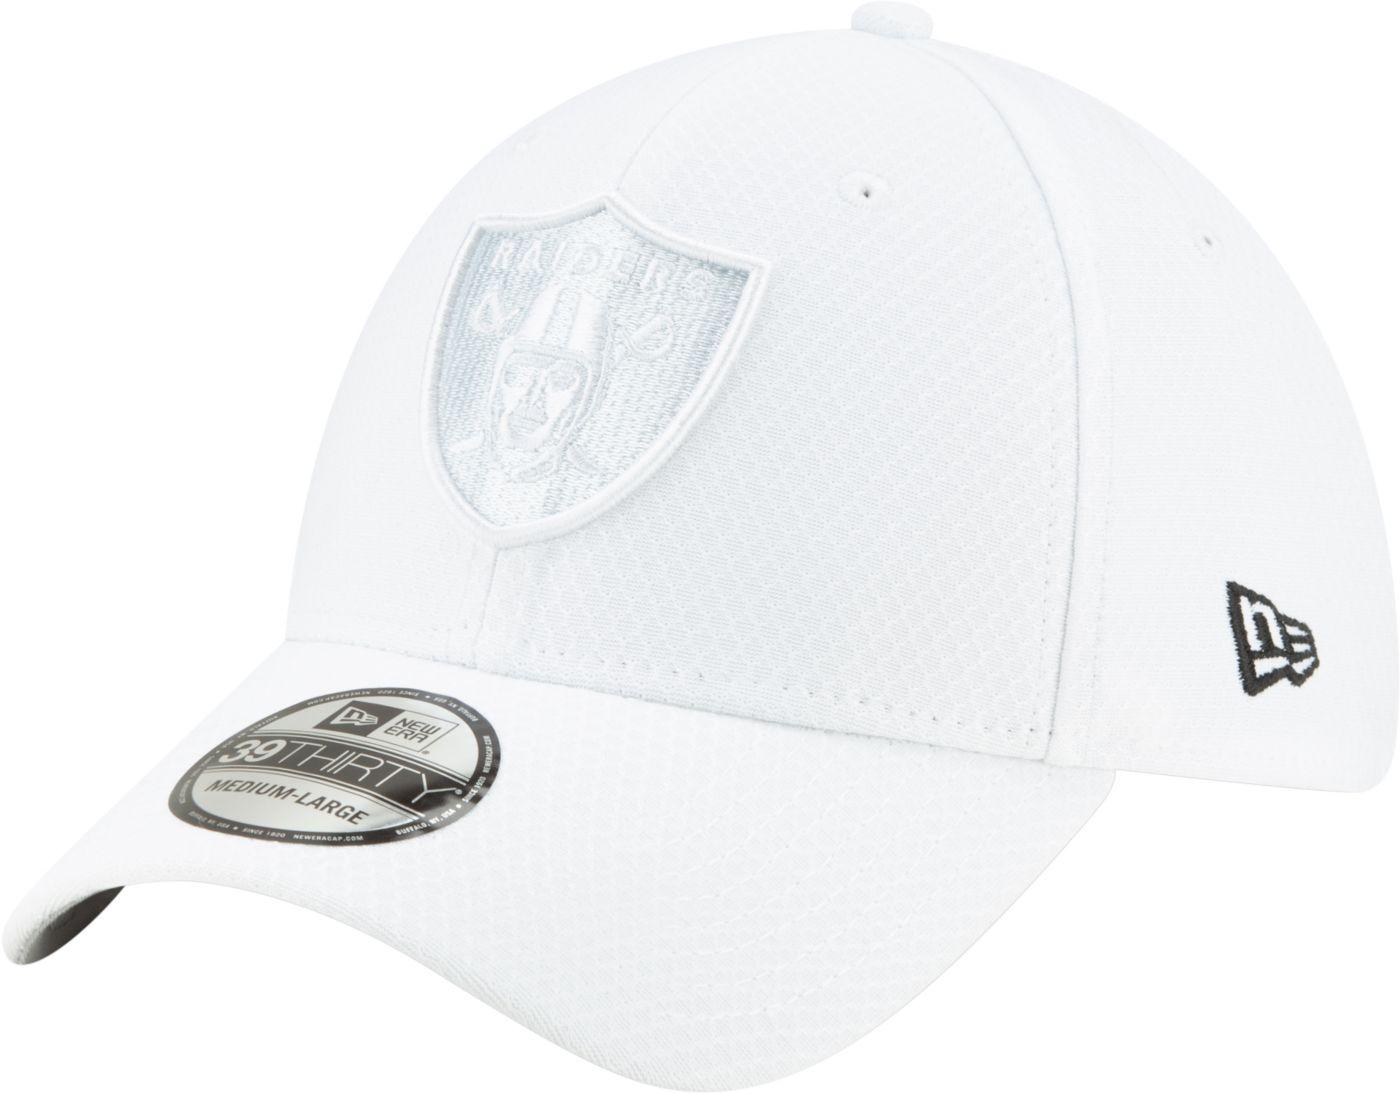 New Era Men's Oakland Raiders Sideline 100th 39Thirty Stretch Fit White Hat